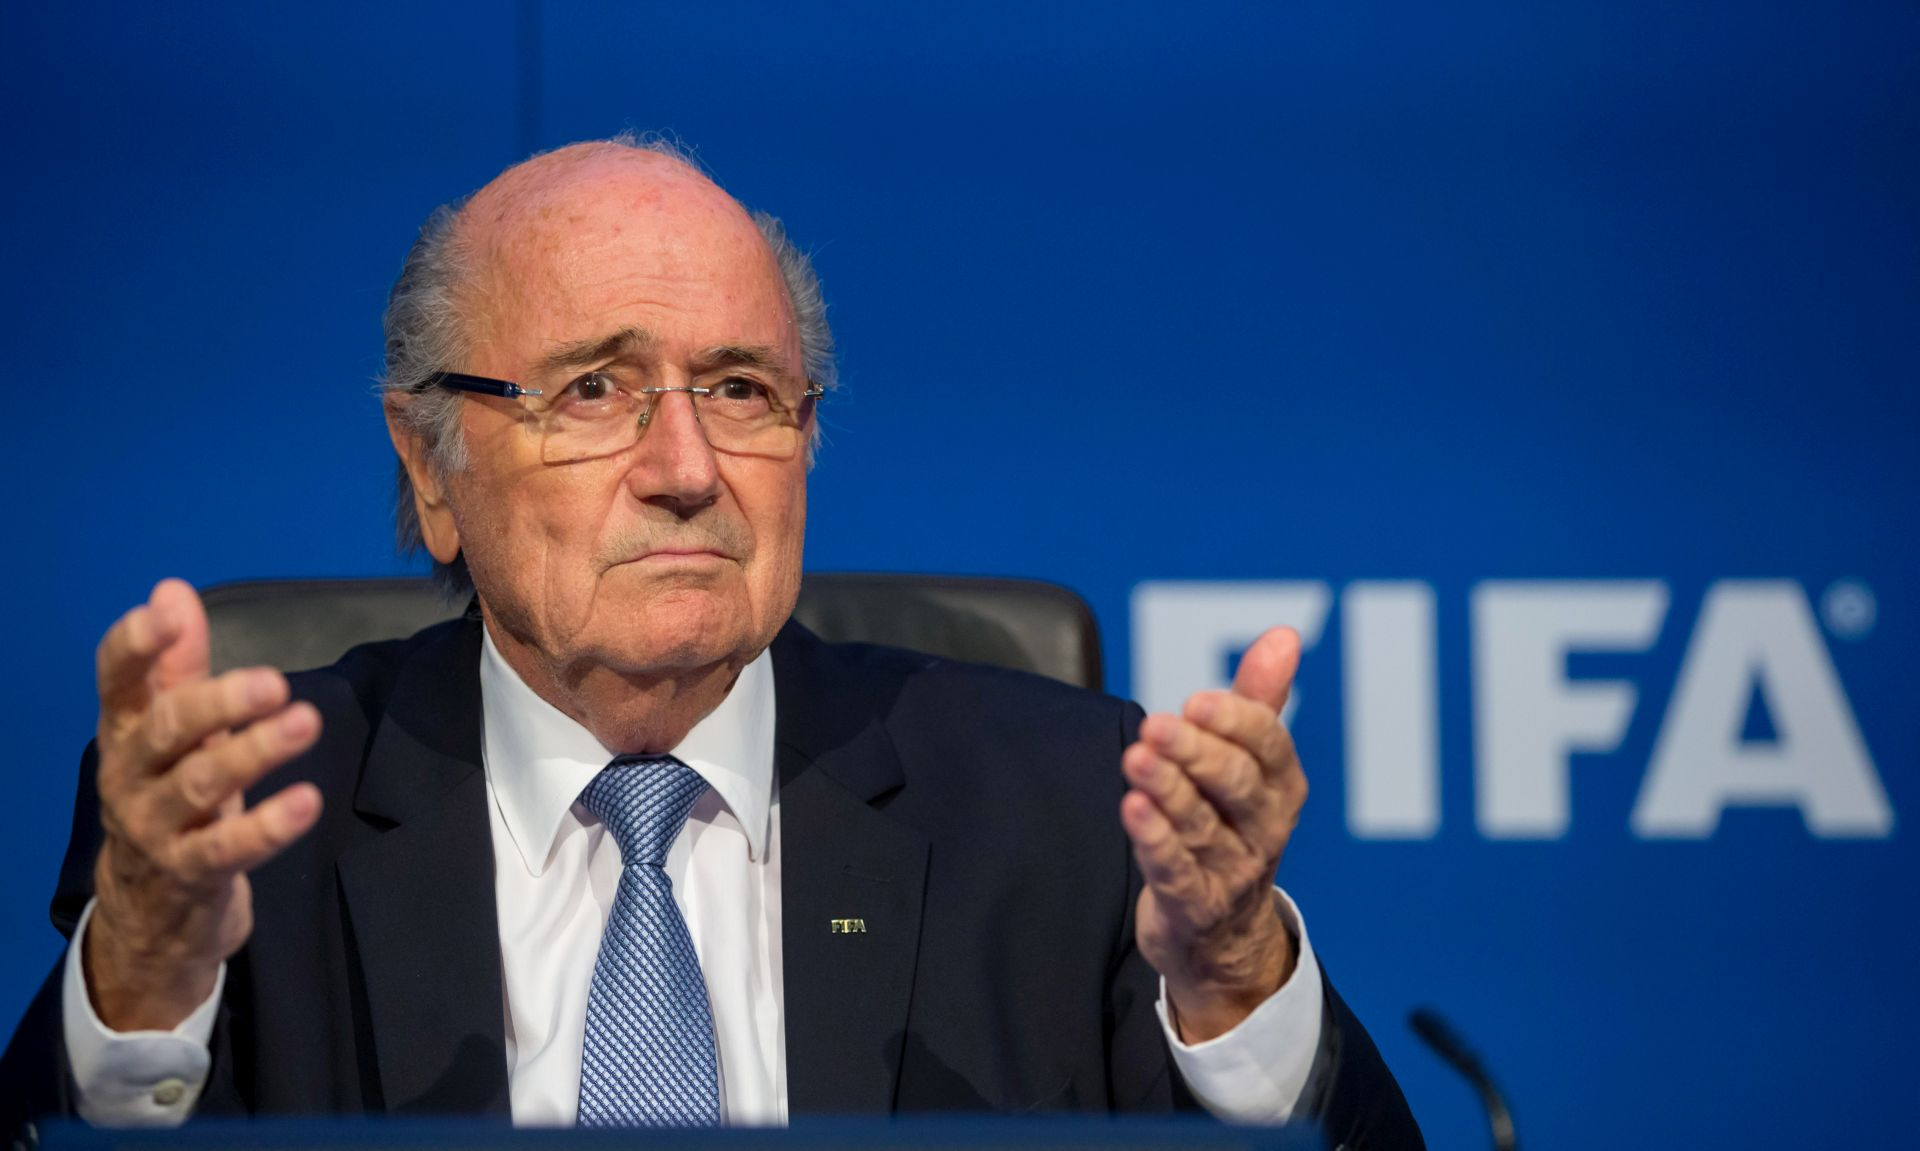 Švicarsko tužiteljstvo podiglo kazneni postupak protiv Seppa Blattera